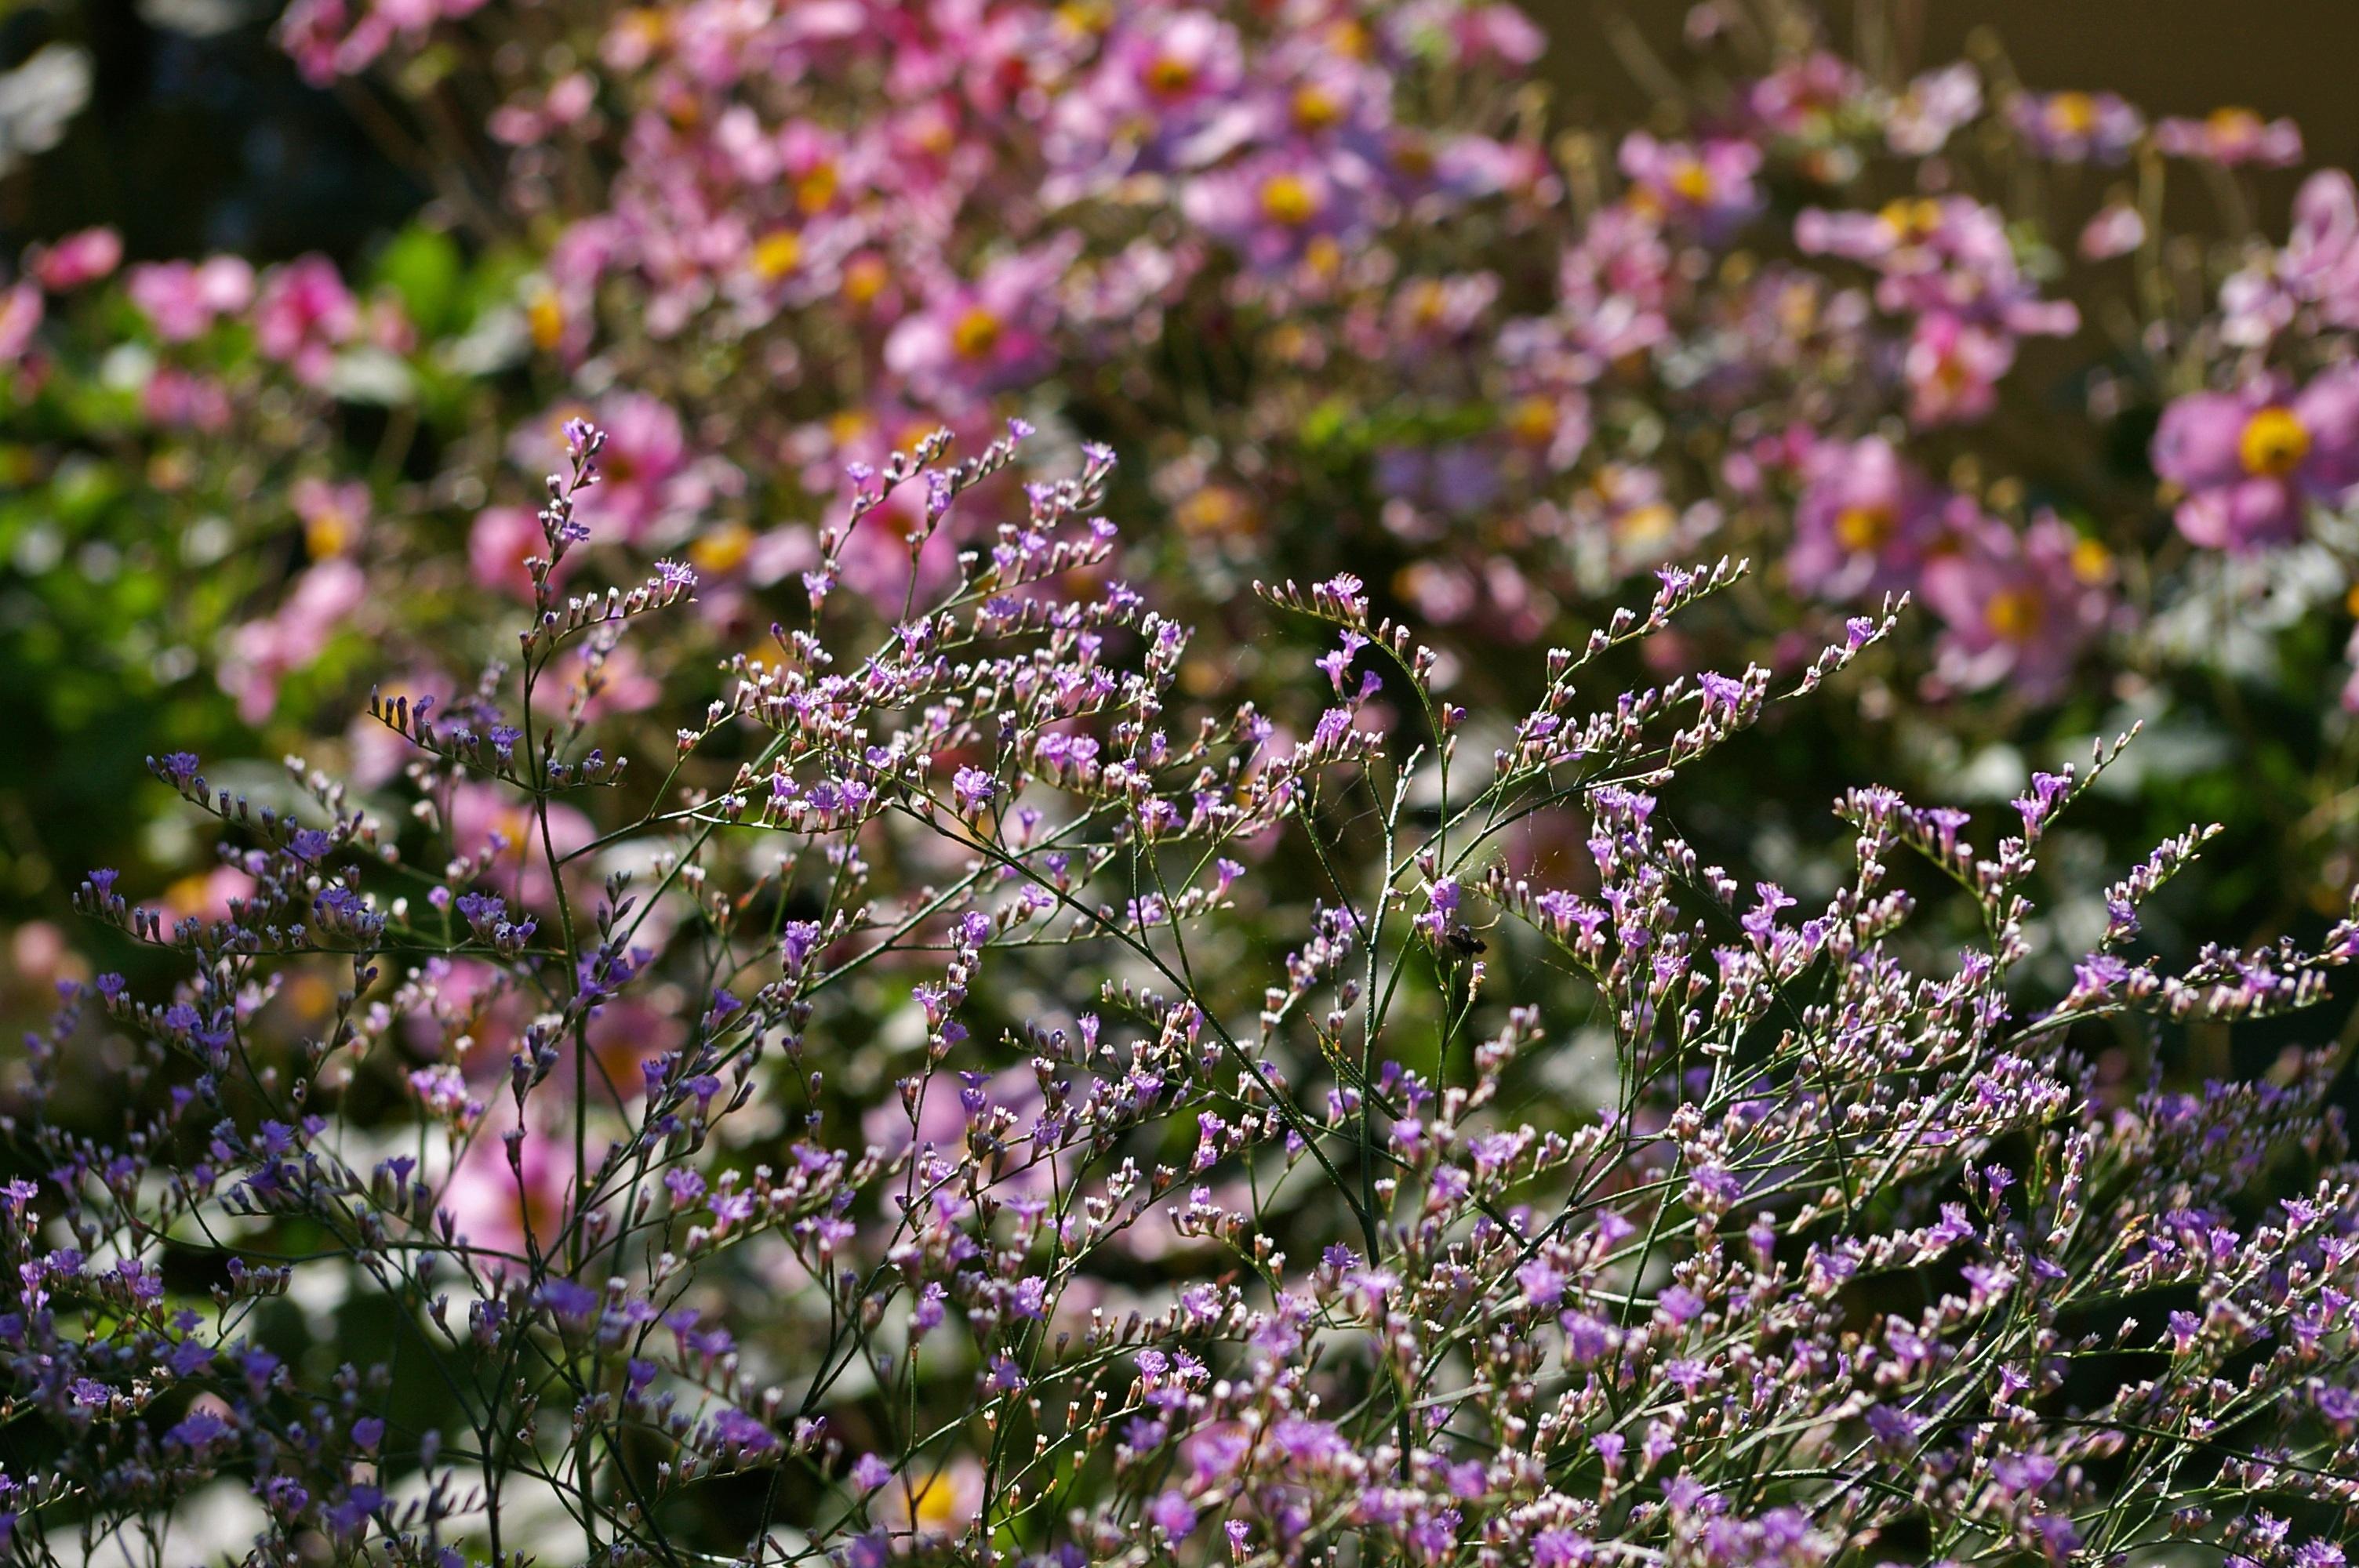 Free images nature grass blossom meadow purple - Plantas de sol directo ...